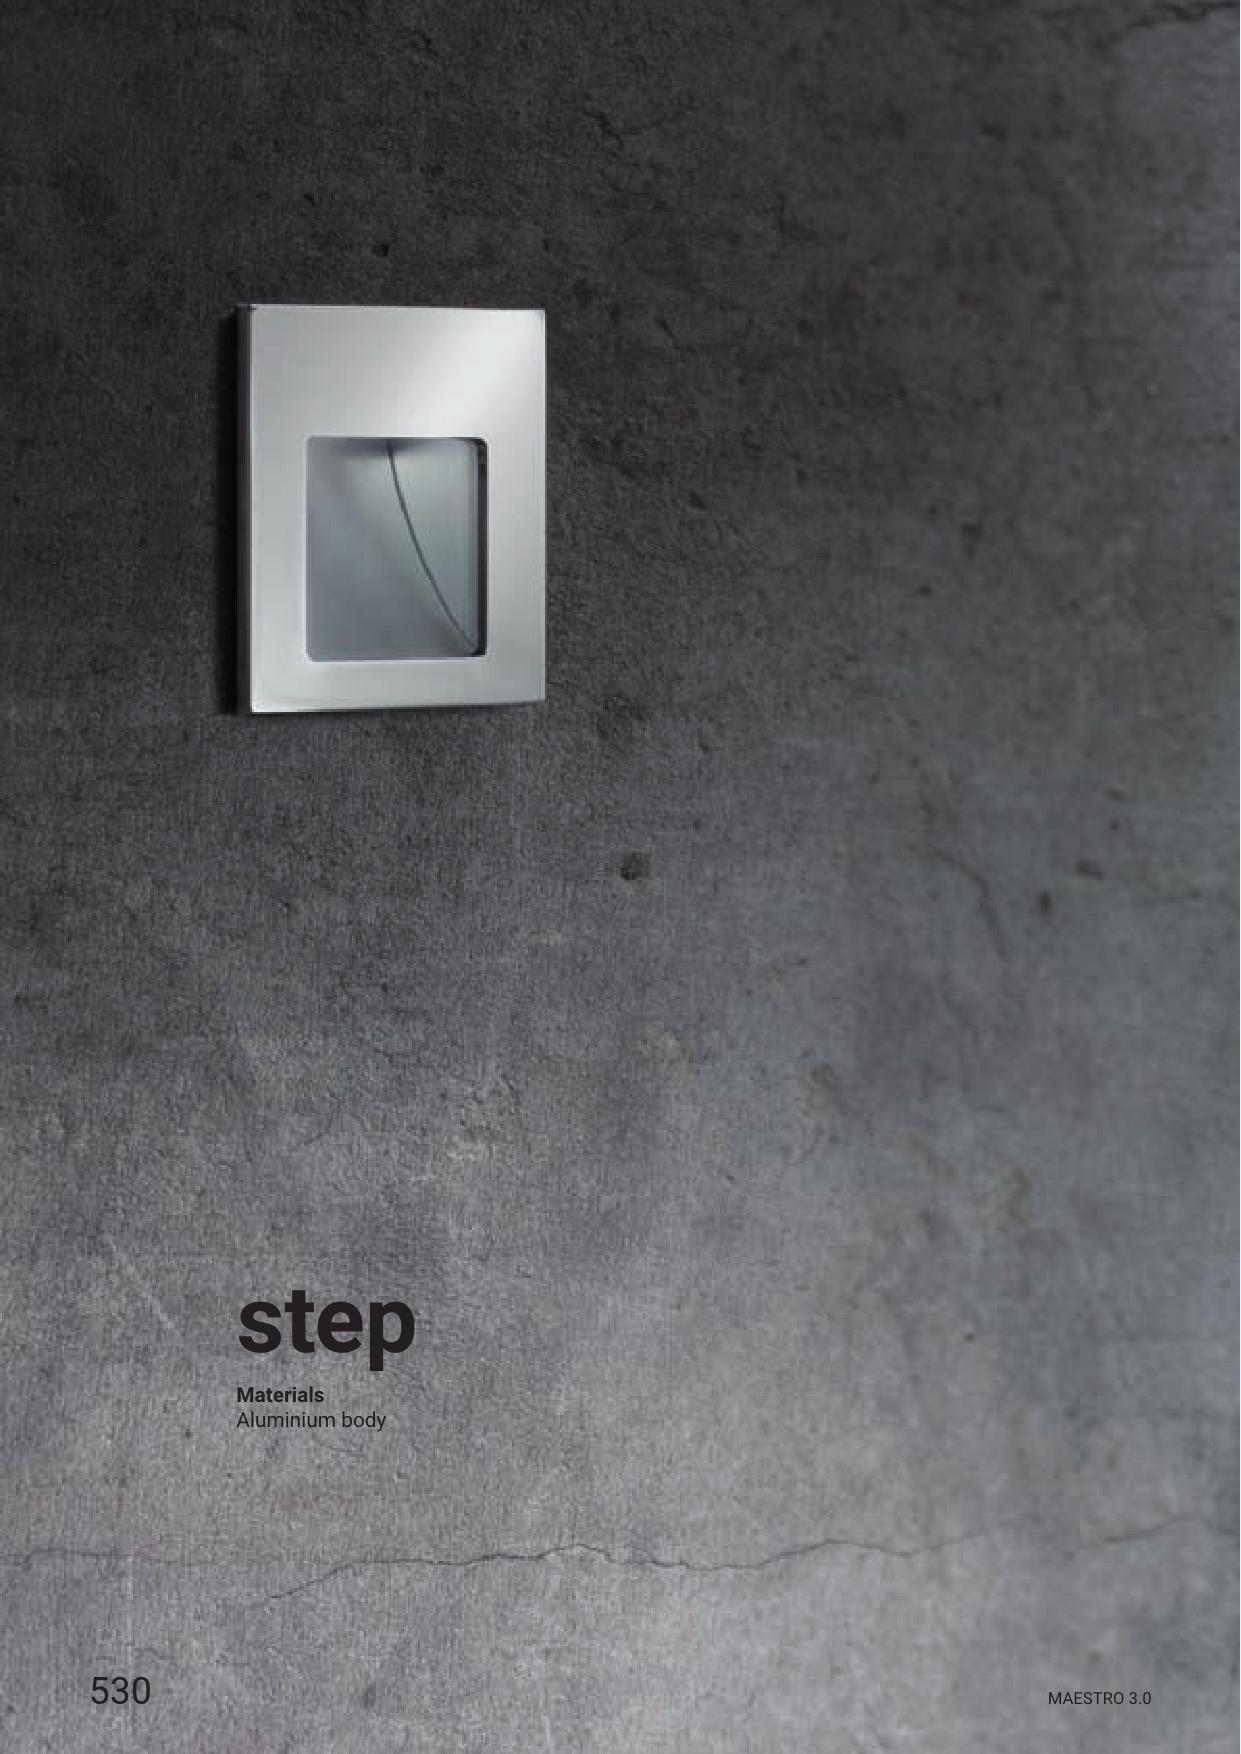 Linea Light – Step